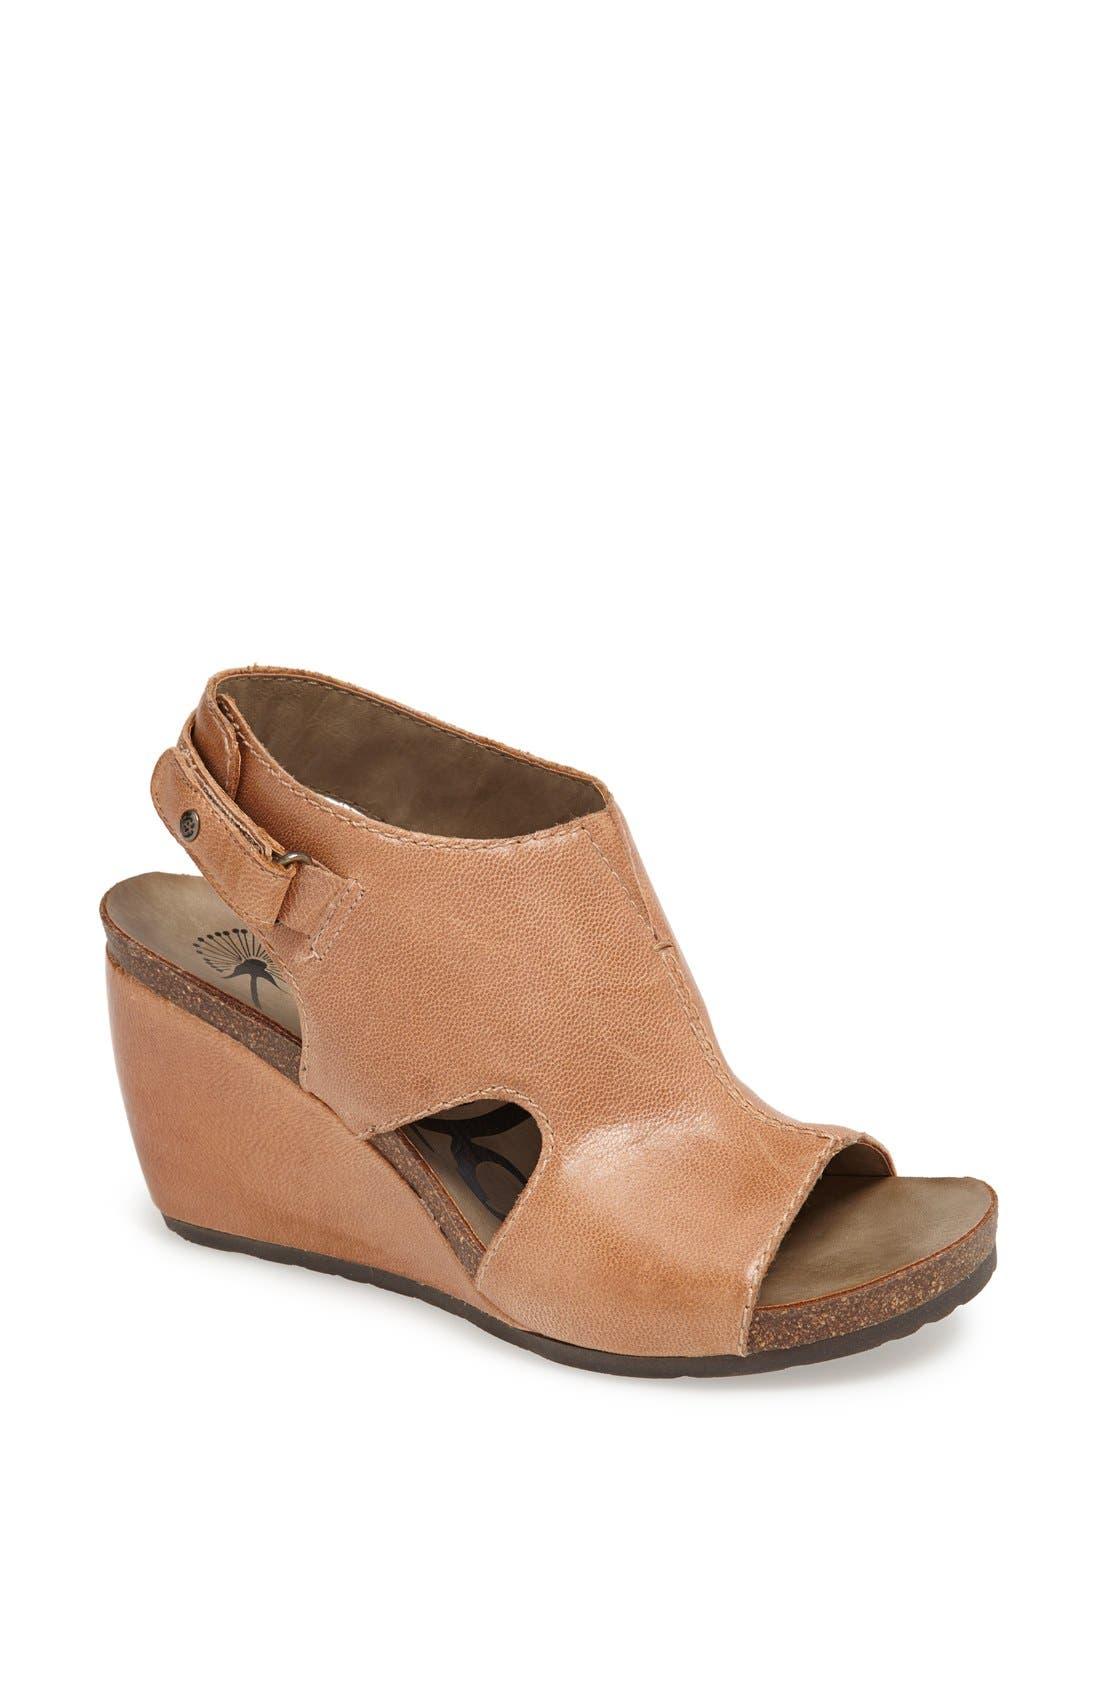 Main Image - OTBT 'Laketown' Sandal